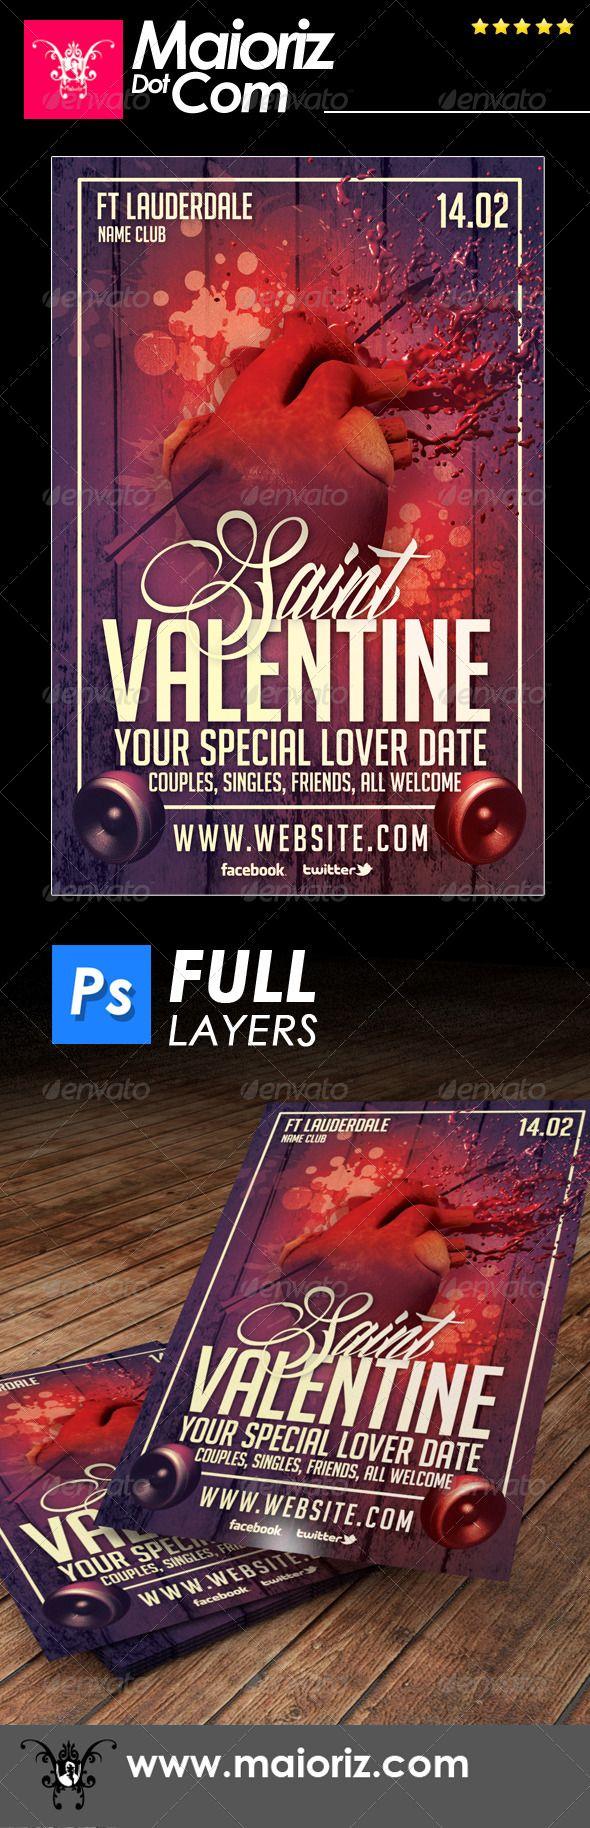 Saint Valentines Flyer Holiday